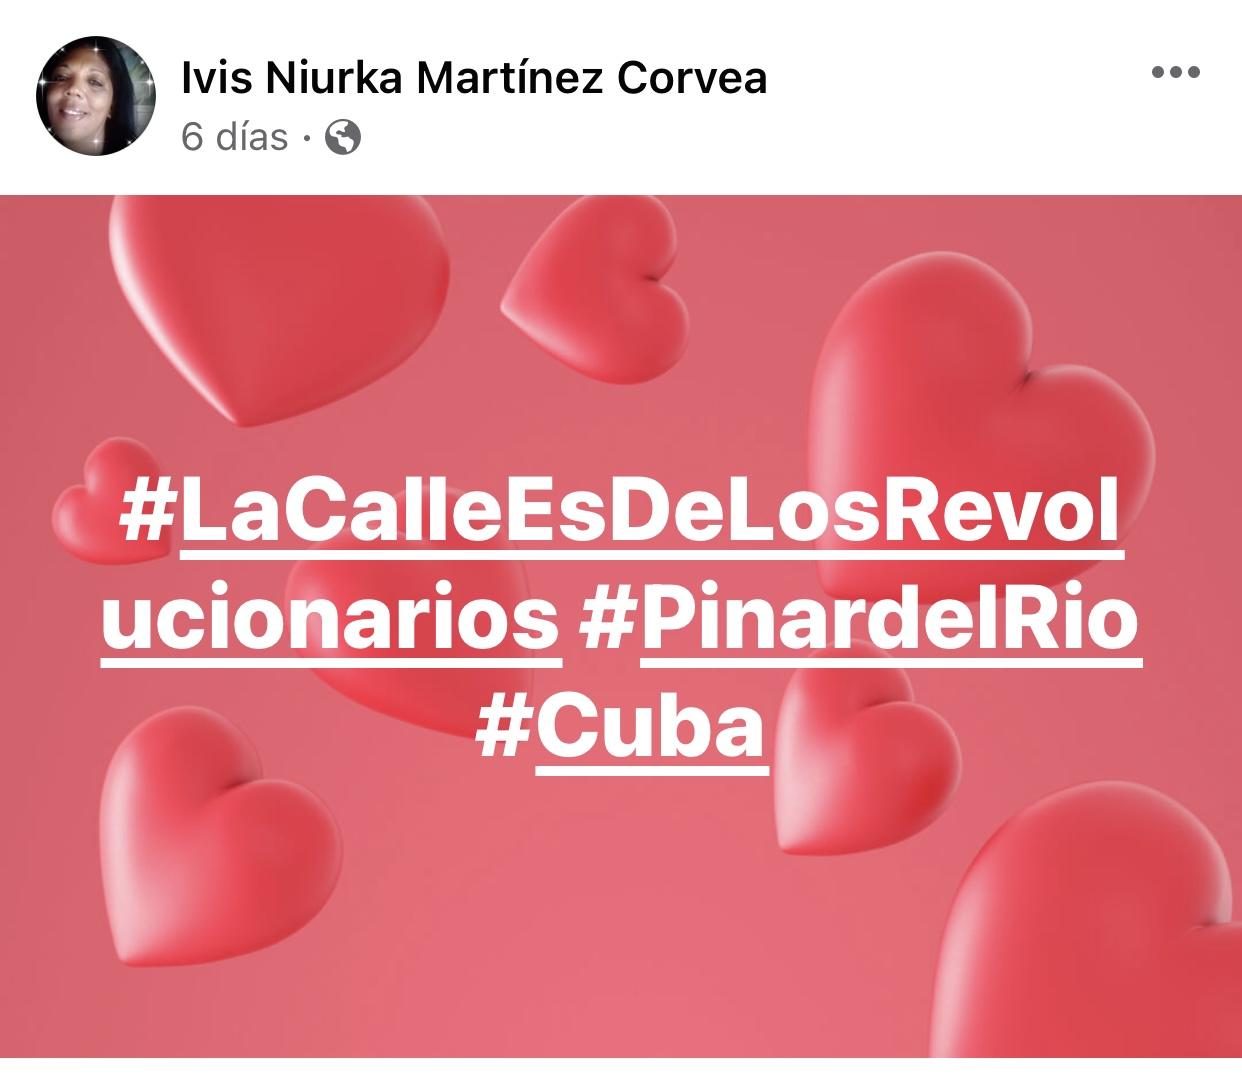 Ivis Niurka Martinez Corvea